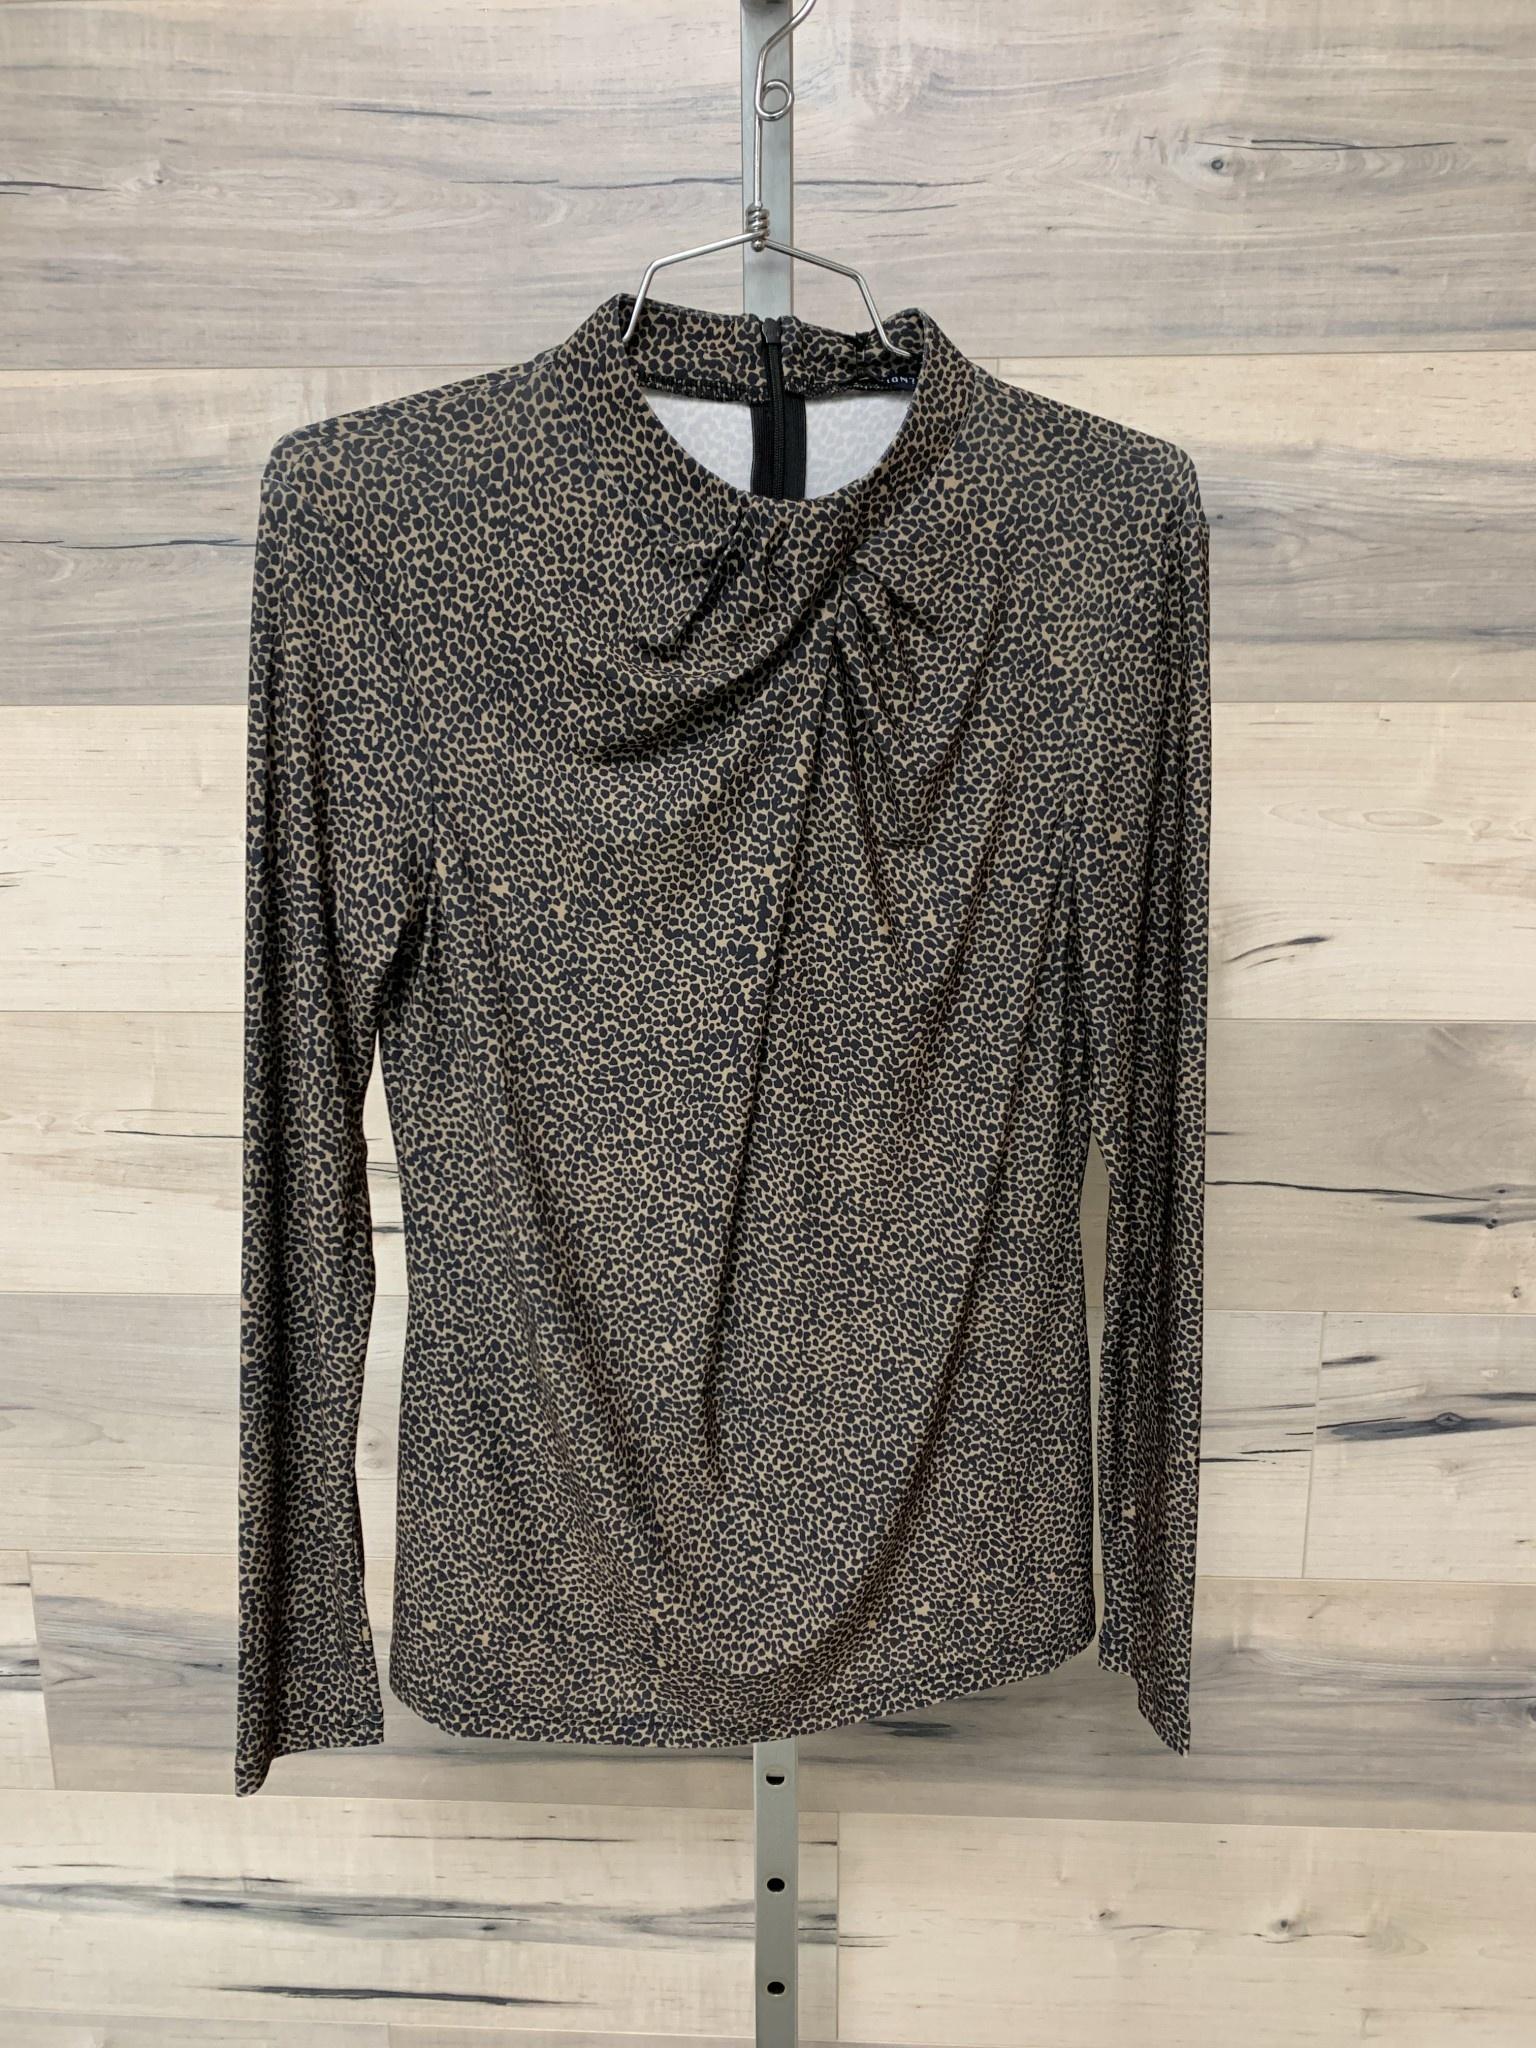 Fancy Tucked Collar Top - Black Speckle